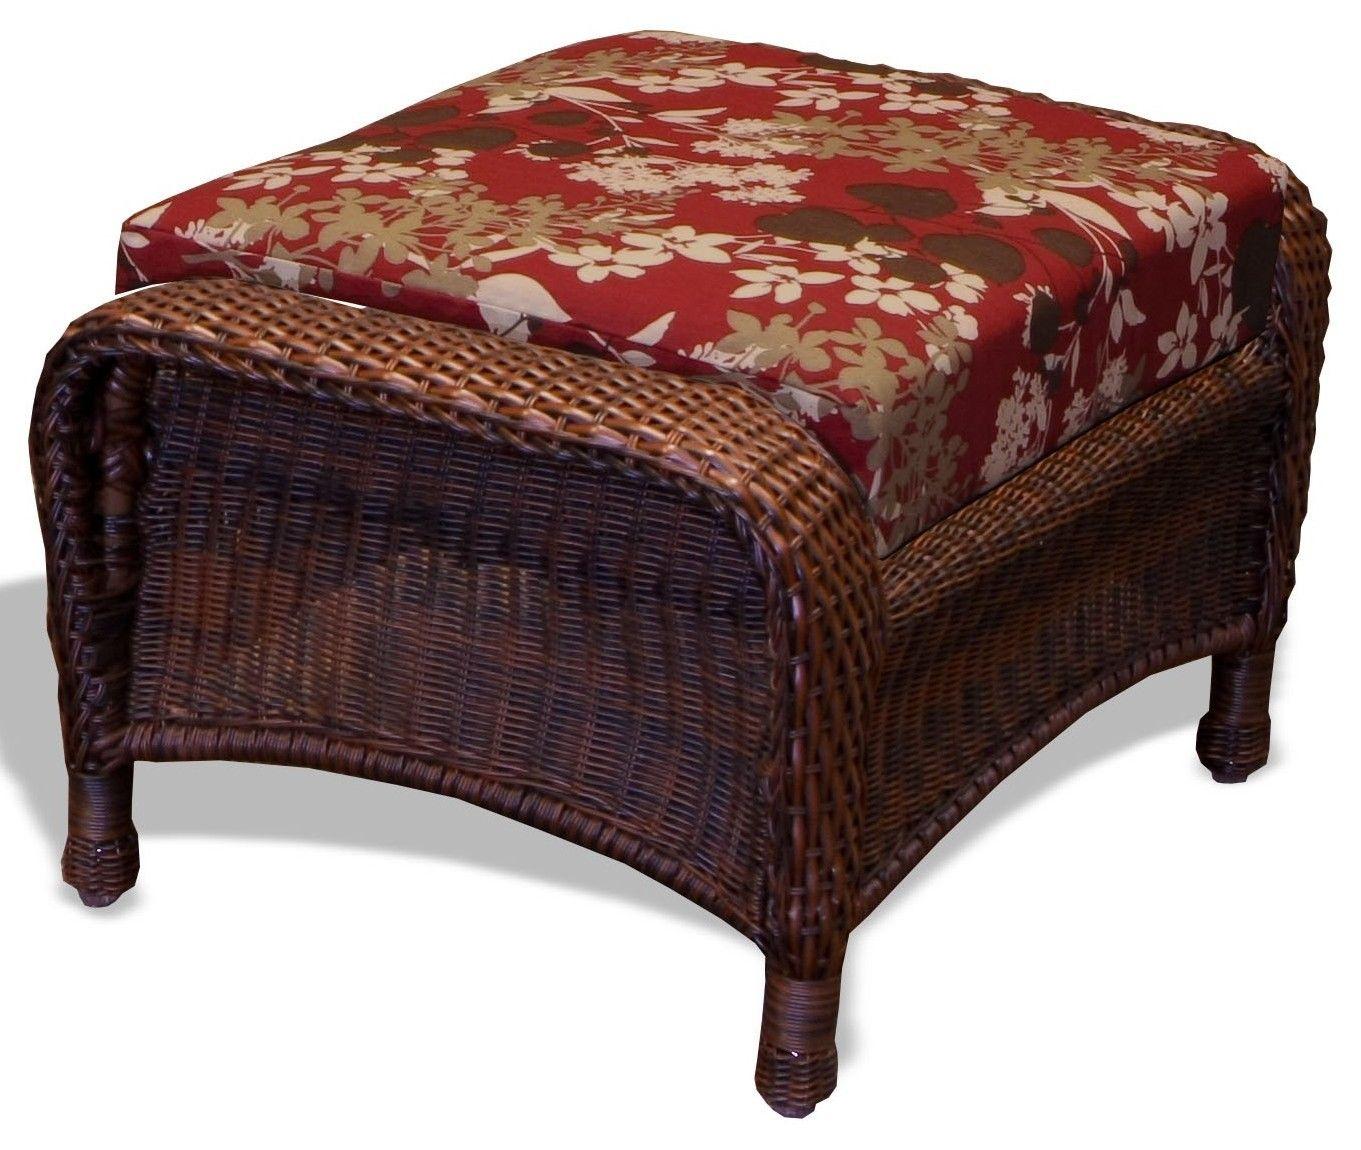 #133 - Outdoor Patio Garden Furniture Java Resin Wicker Ottoman in Montfleuri Sangria